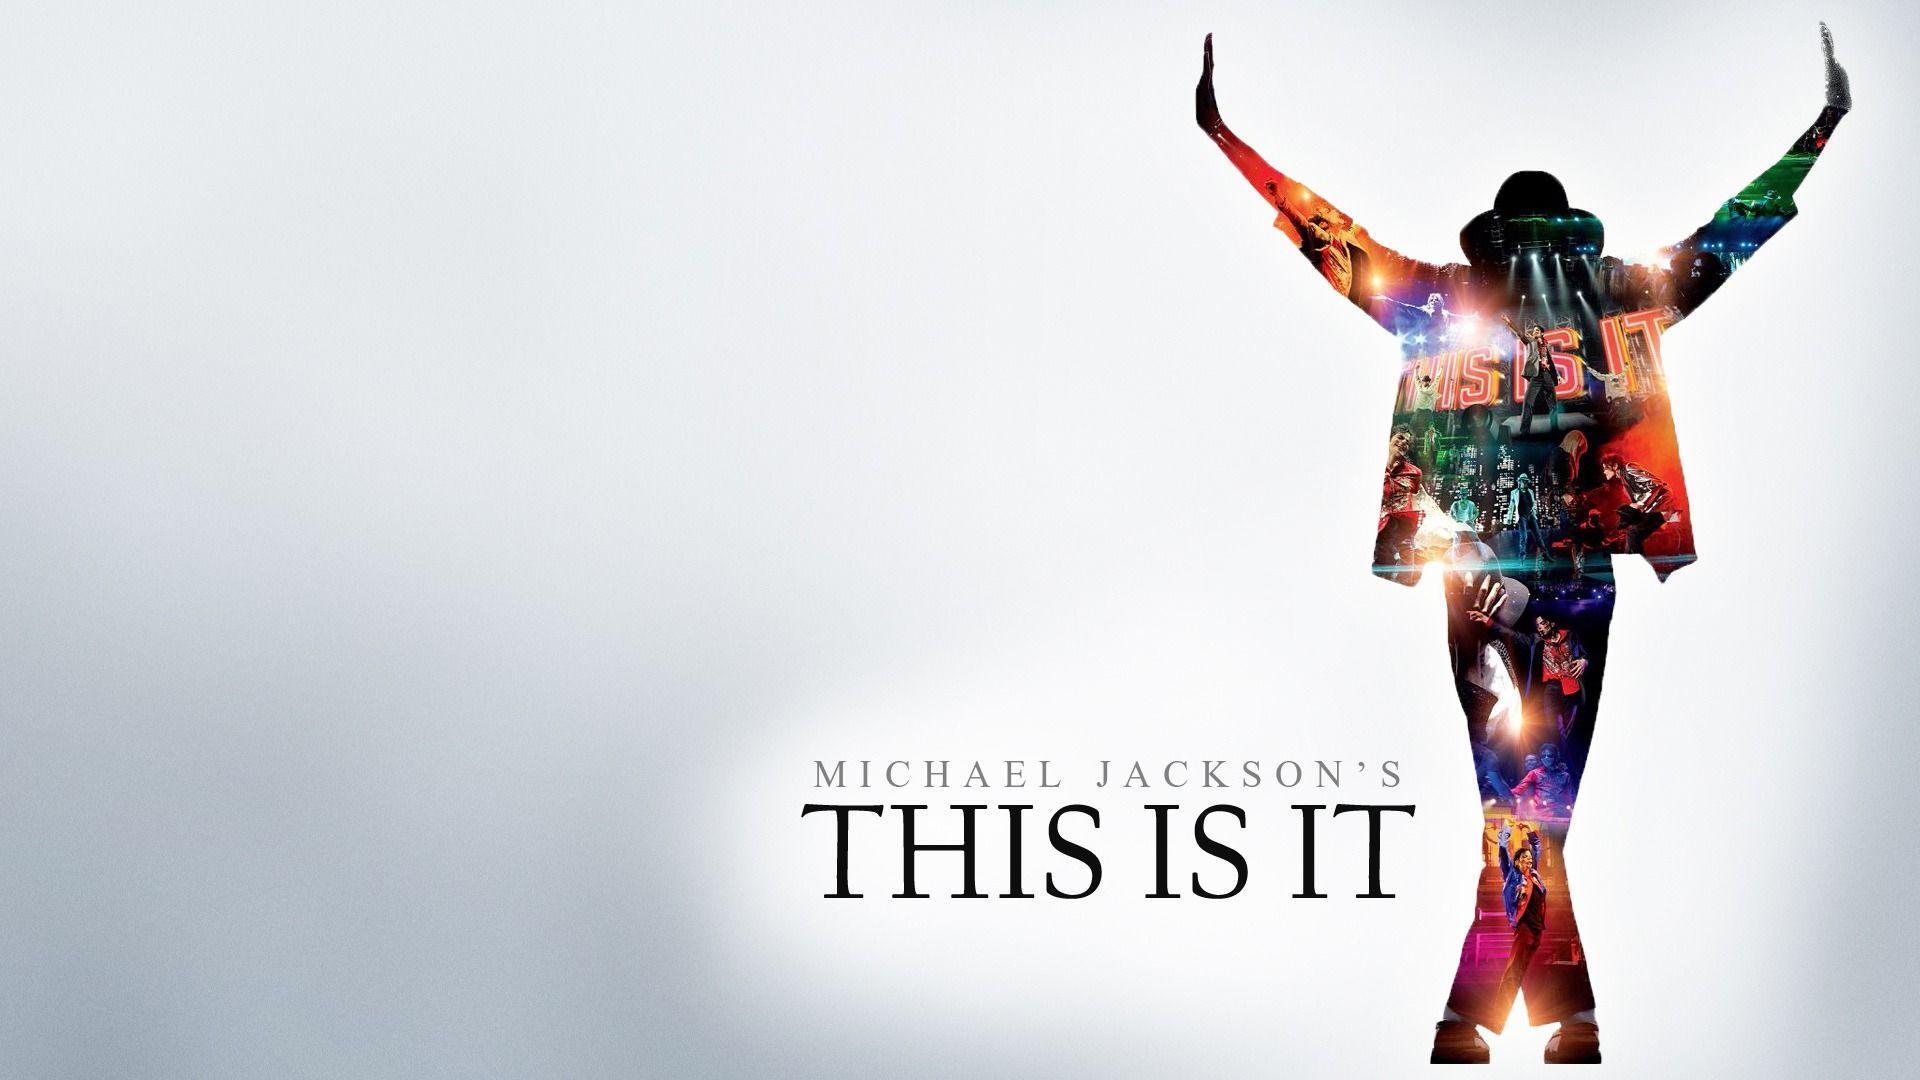 Michael Jackson This Is It Album wallpaper - 487858